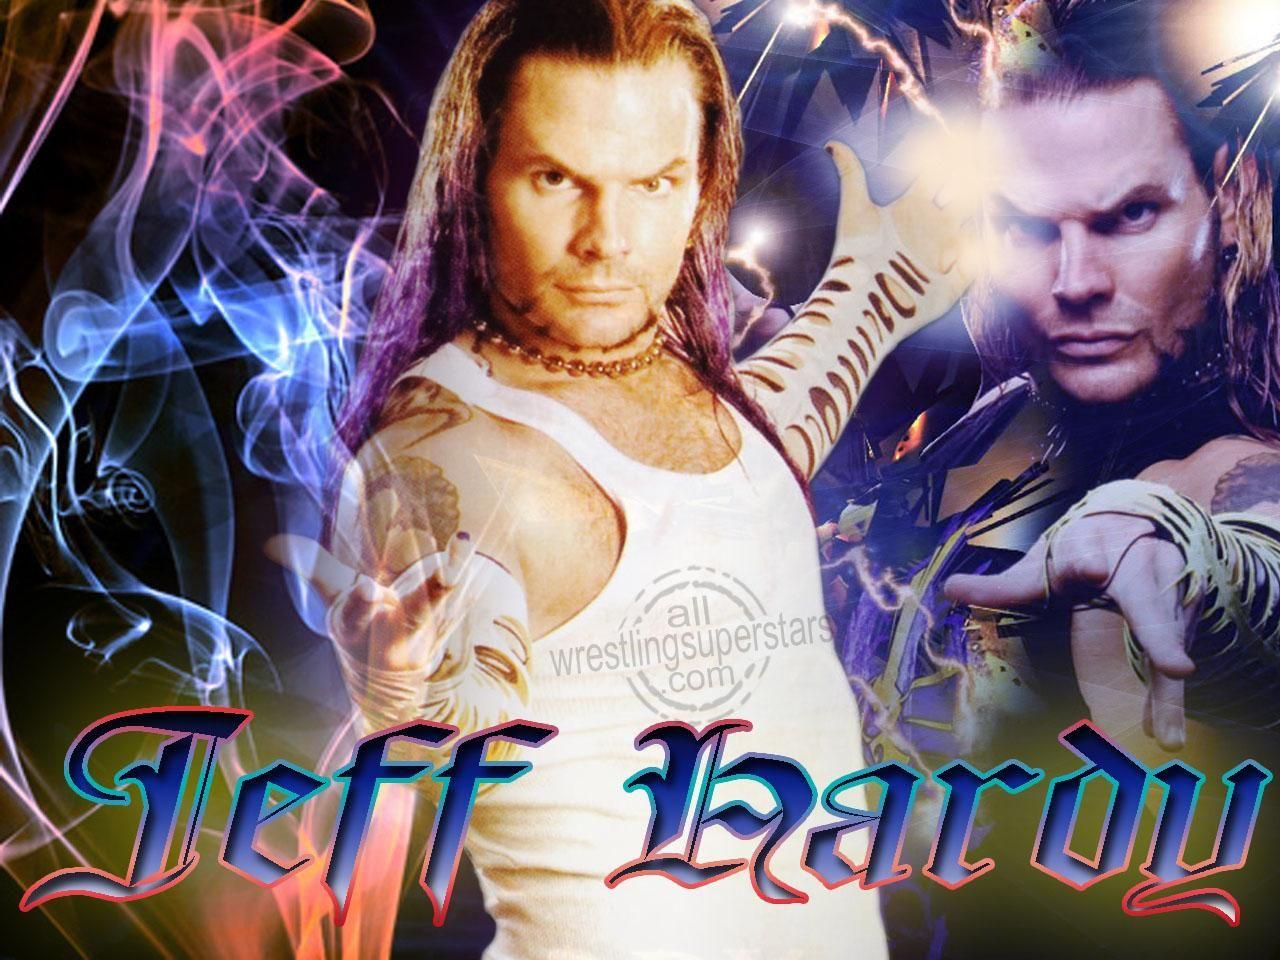 Pin By Allstarme On Jeff Hardy Jeff Hardy The Hardy Boyz Hardy Boys